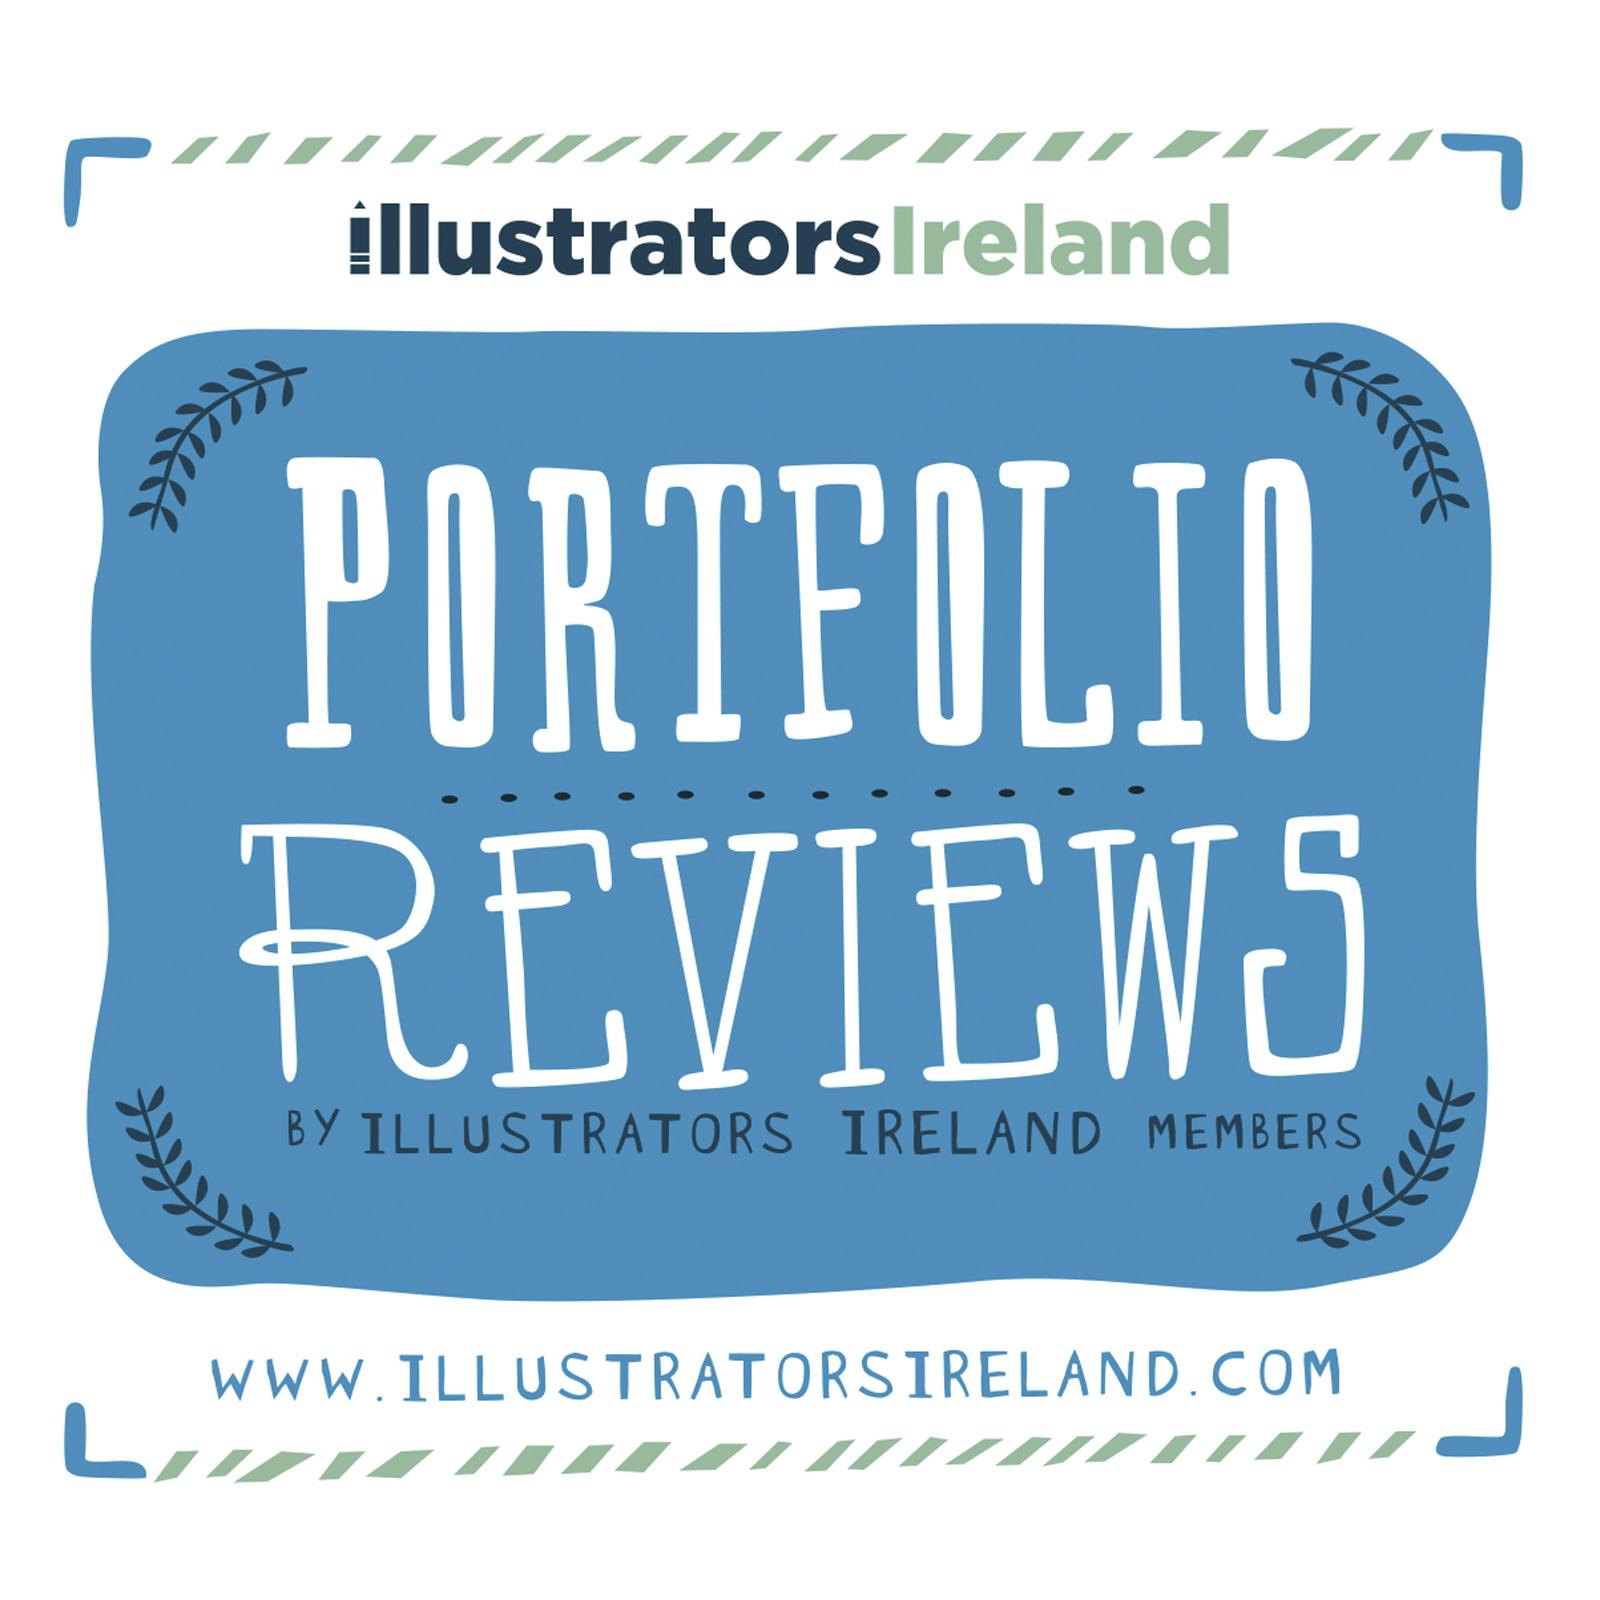 wed_21st_3pm5pm_br_aoi_portfolio_review